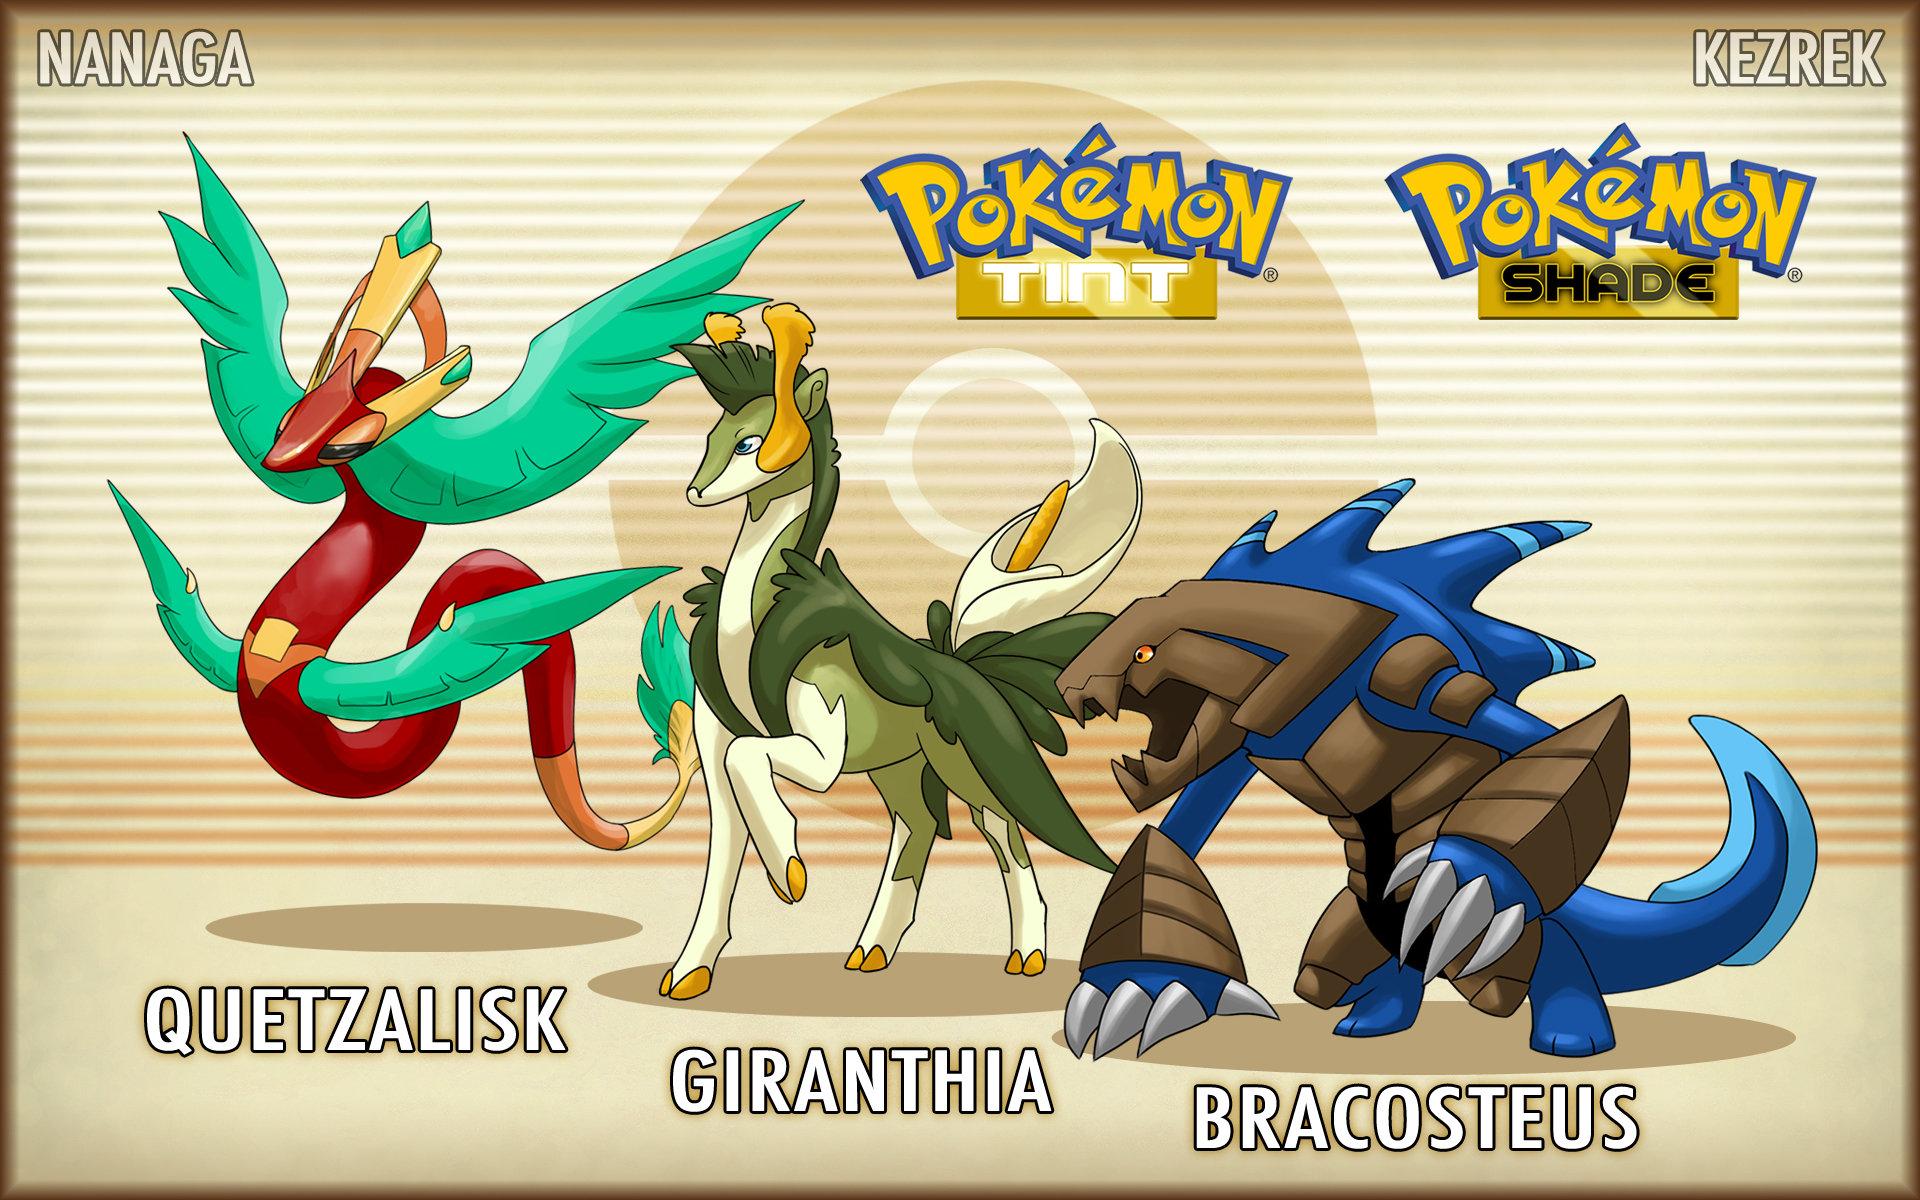 Real Art Design Group : Pokemon sanki starters final evos reveal by kezrek on